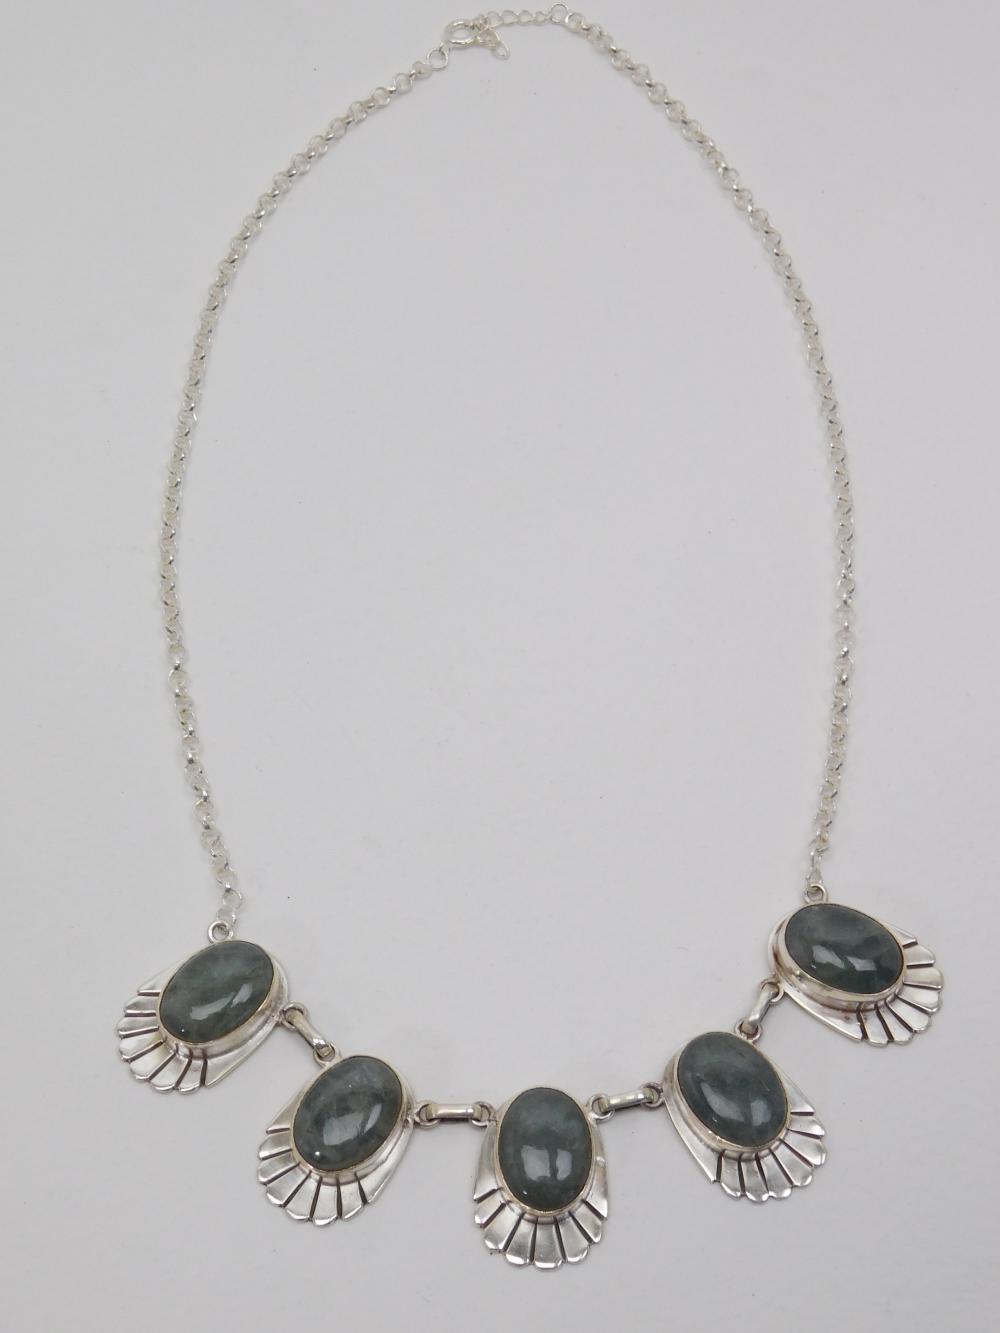 Vintage Mexico Handmade Sterling Silver Labradorite 5 Stone Necklace 43.5G